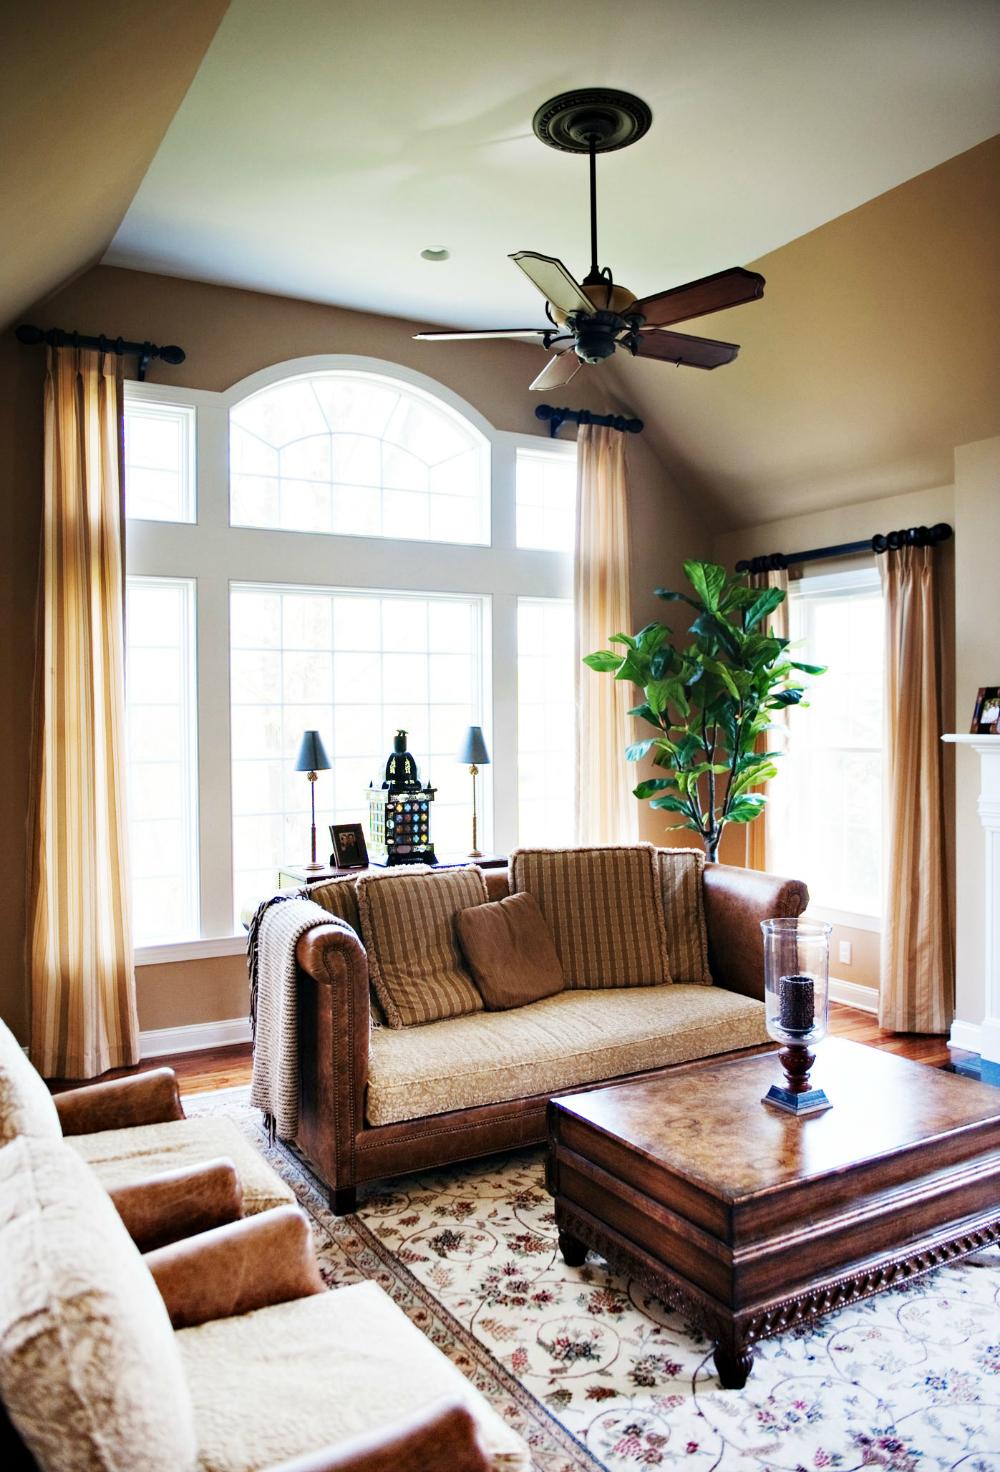 sarah hermans interior design family room.jpg